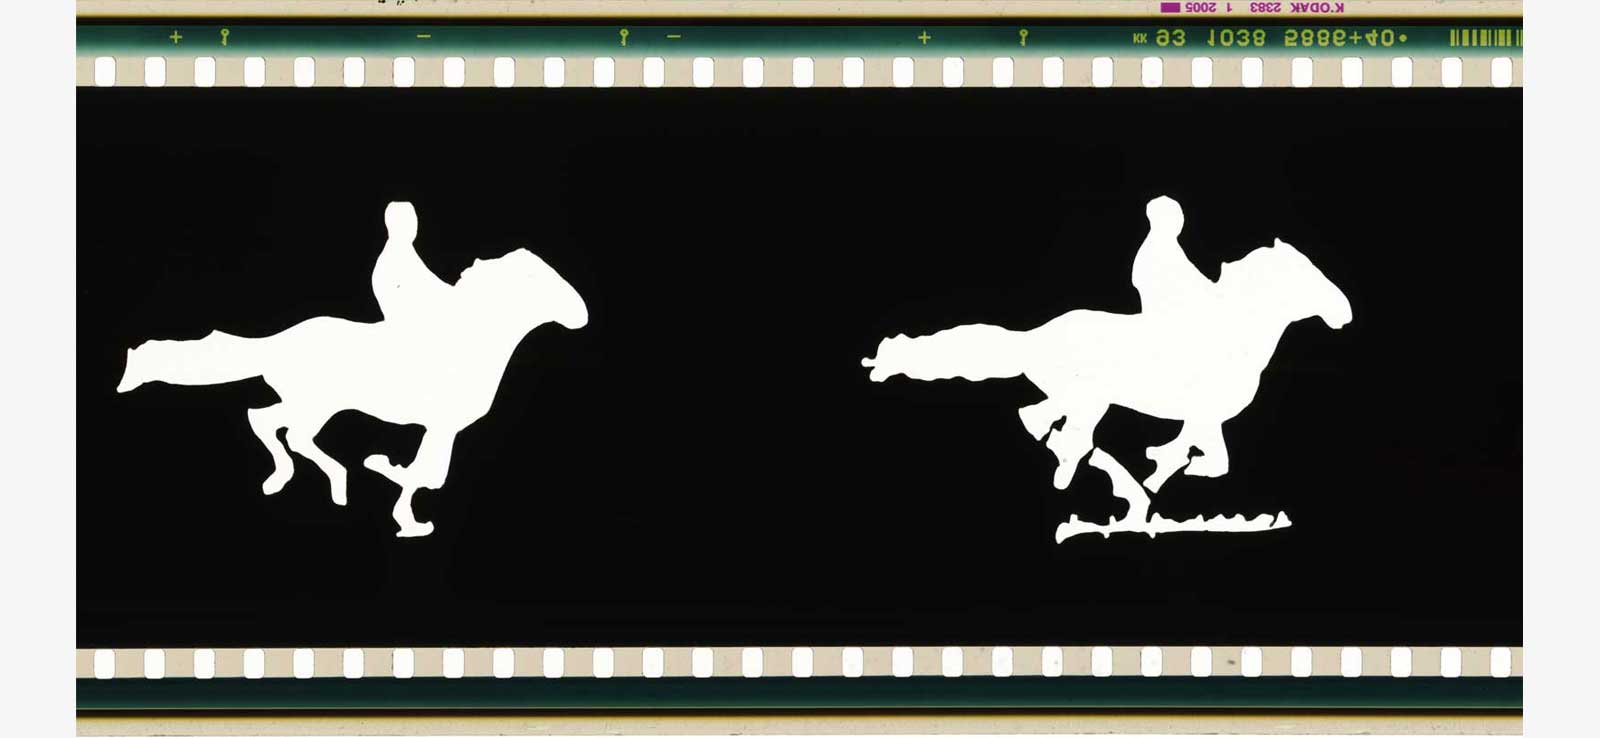 Antoni Pinent Qr Code film frame